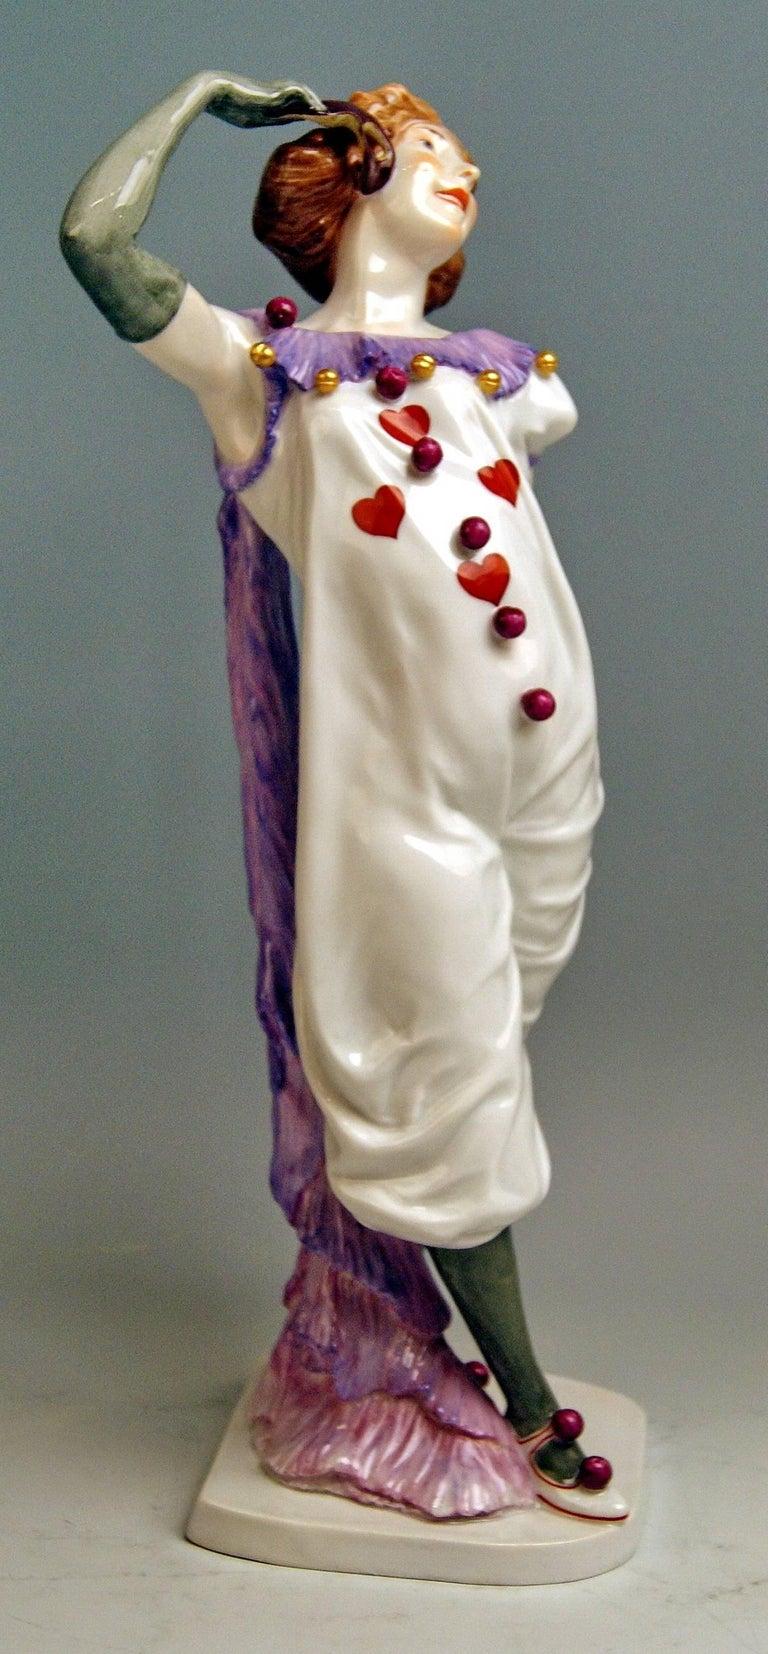 Art Nouveau Meissen Pierrette Model Y 165 Wiegand Martin Tall Figurine Made, 1909-1915 For Sale